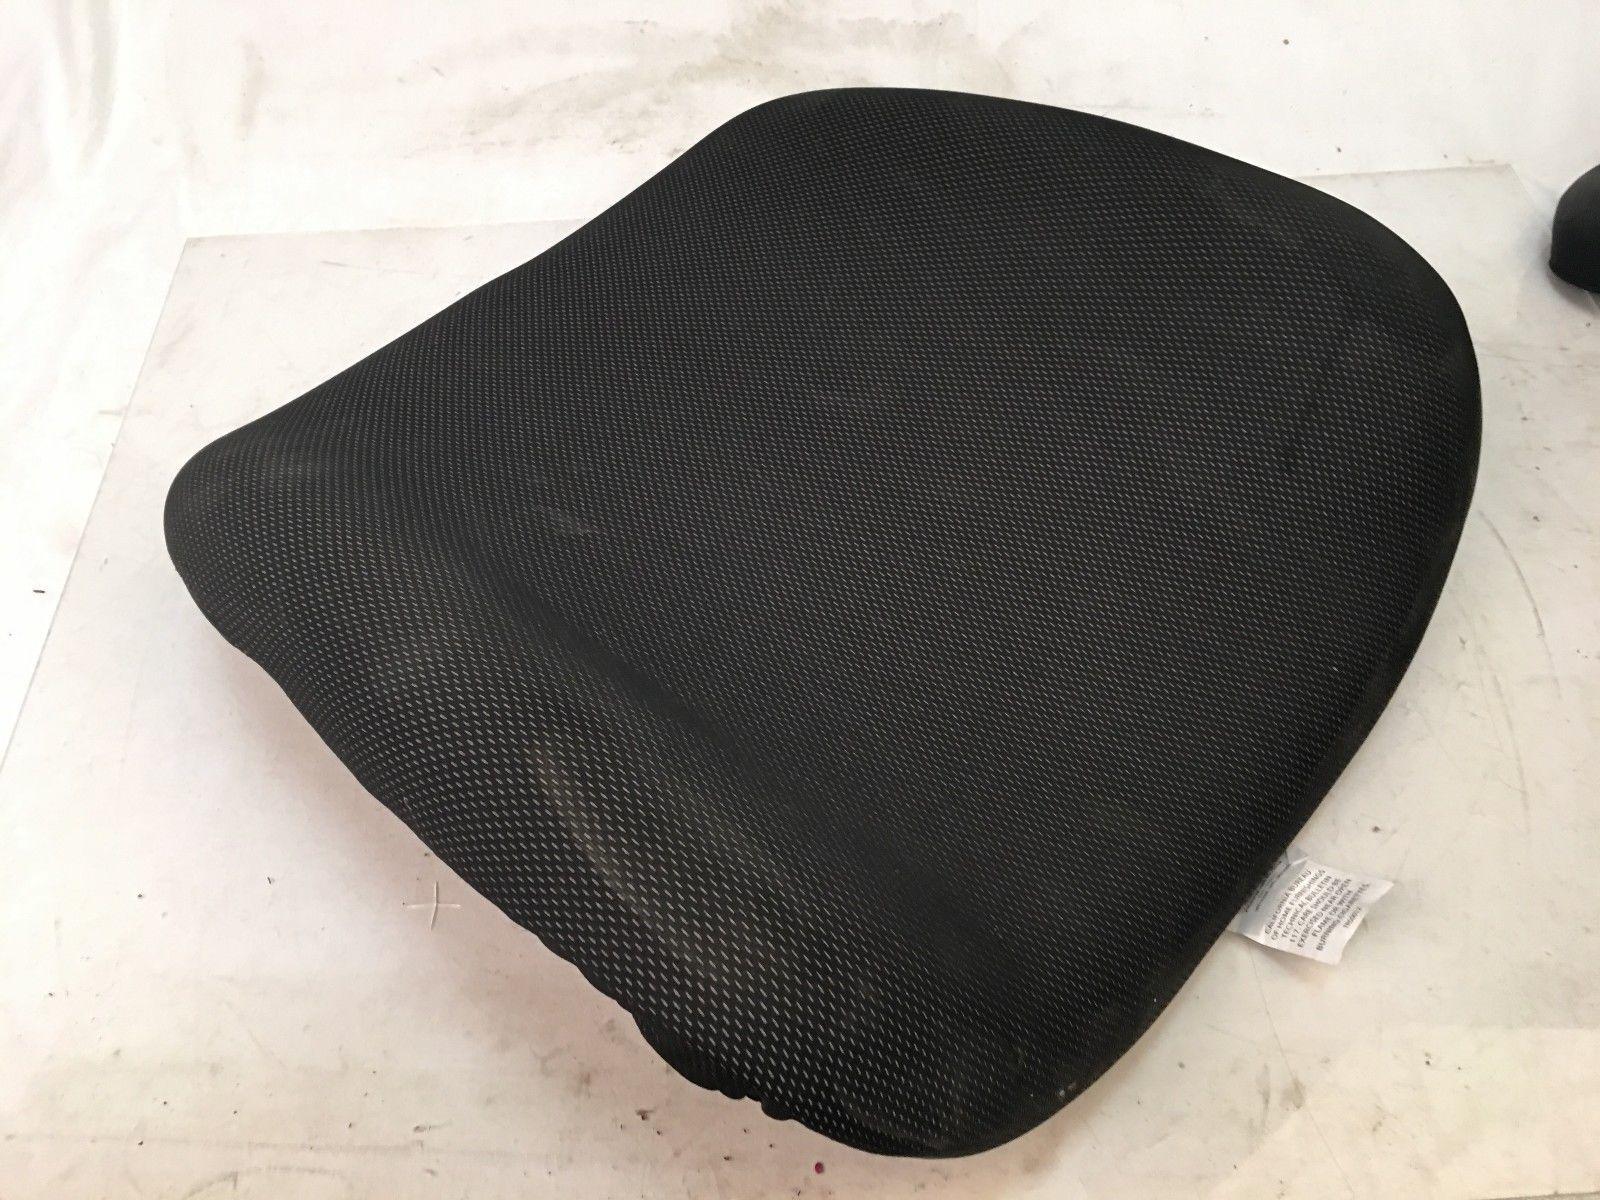 22x22 Invacare Matrx PB Back Rest Cushion w/ Mounts from Pride Quantum R-4000